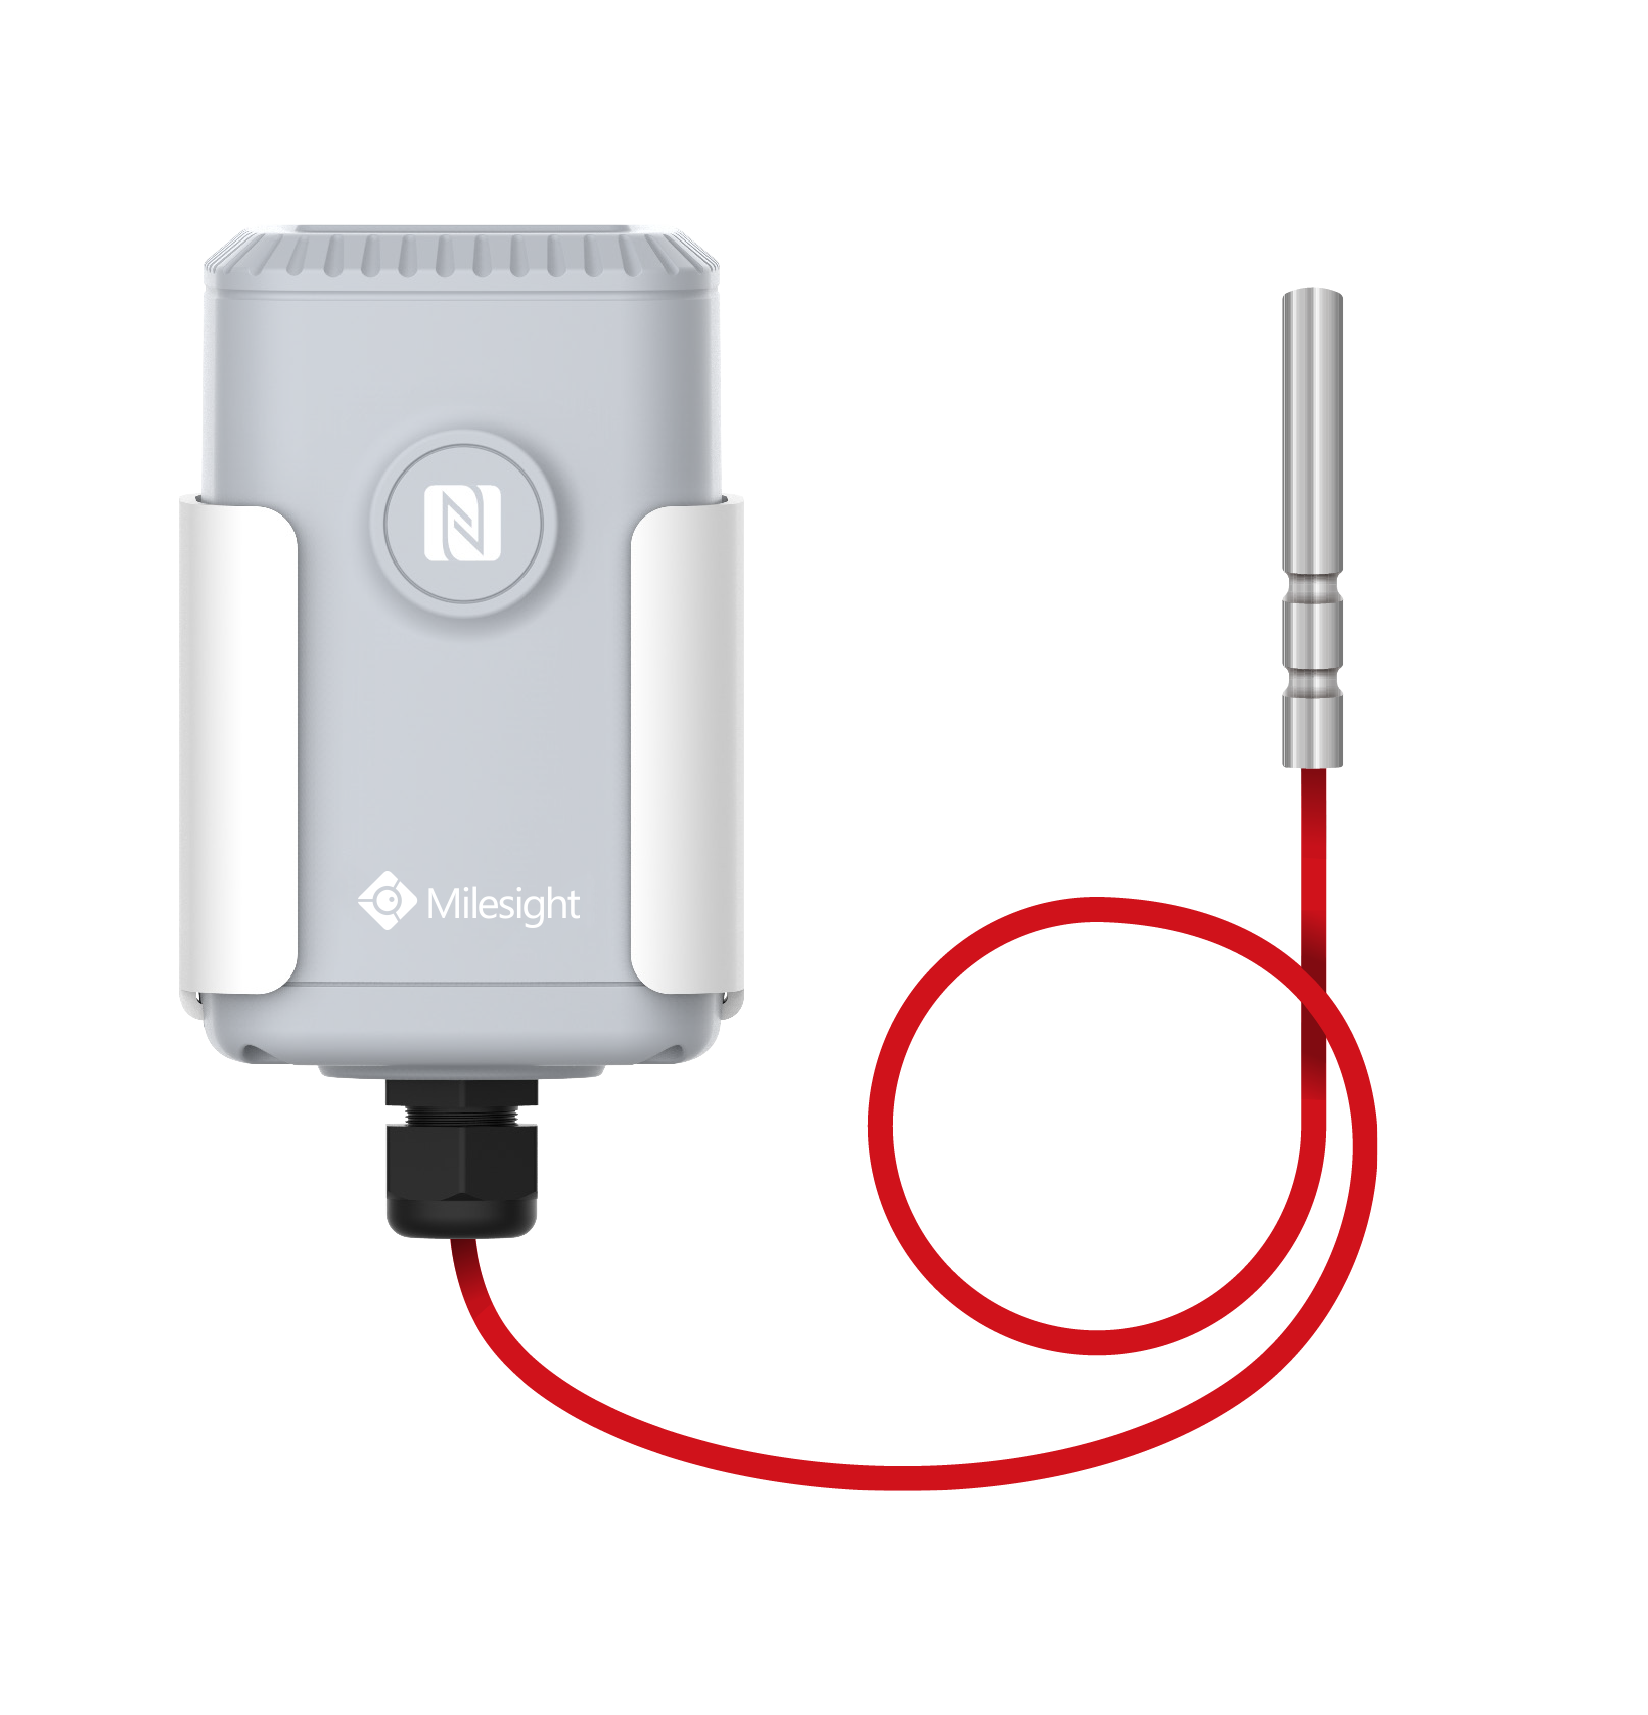 Milesight IoT EM500-PT100-T050 LoRaWAN Temperatursensor